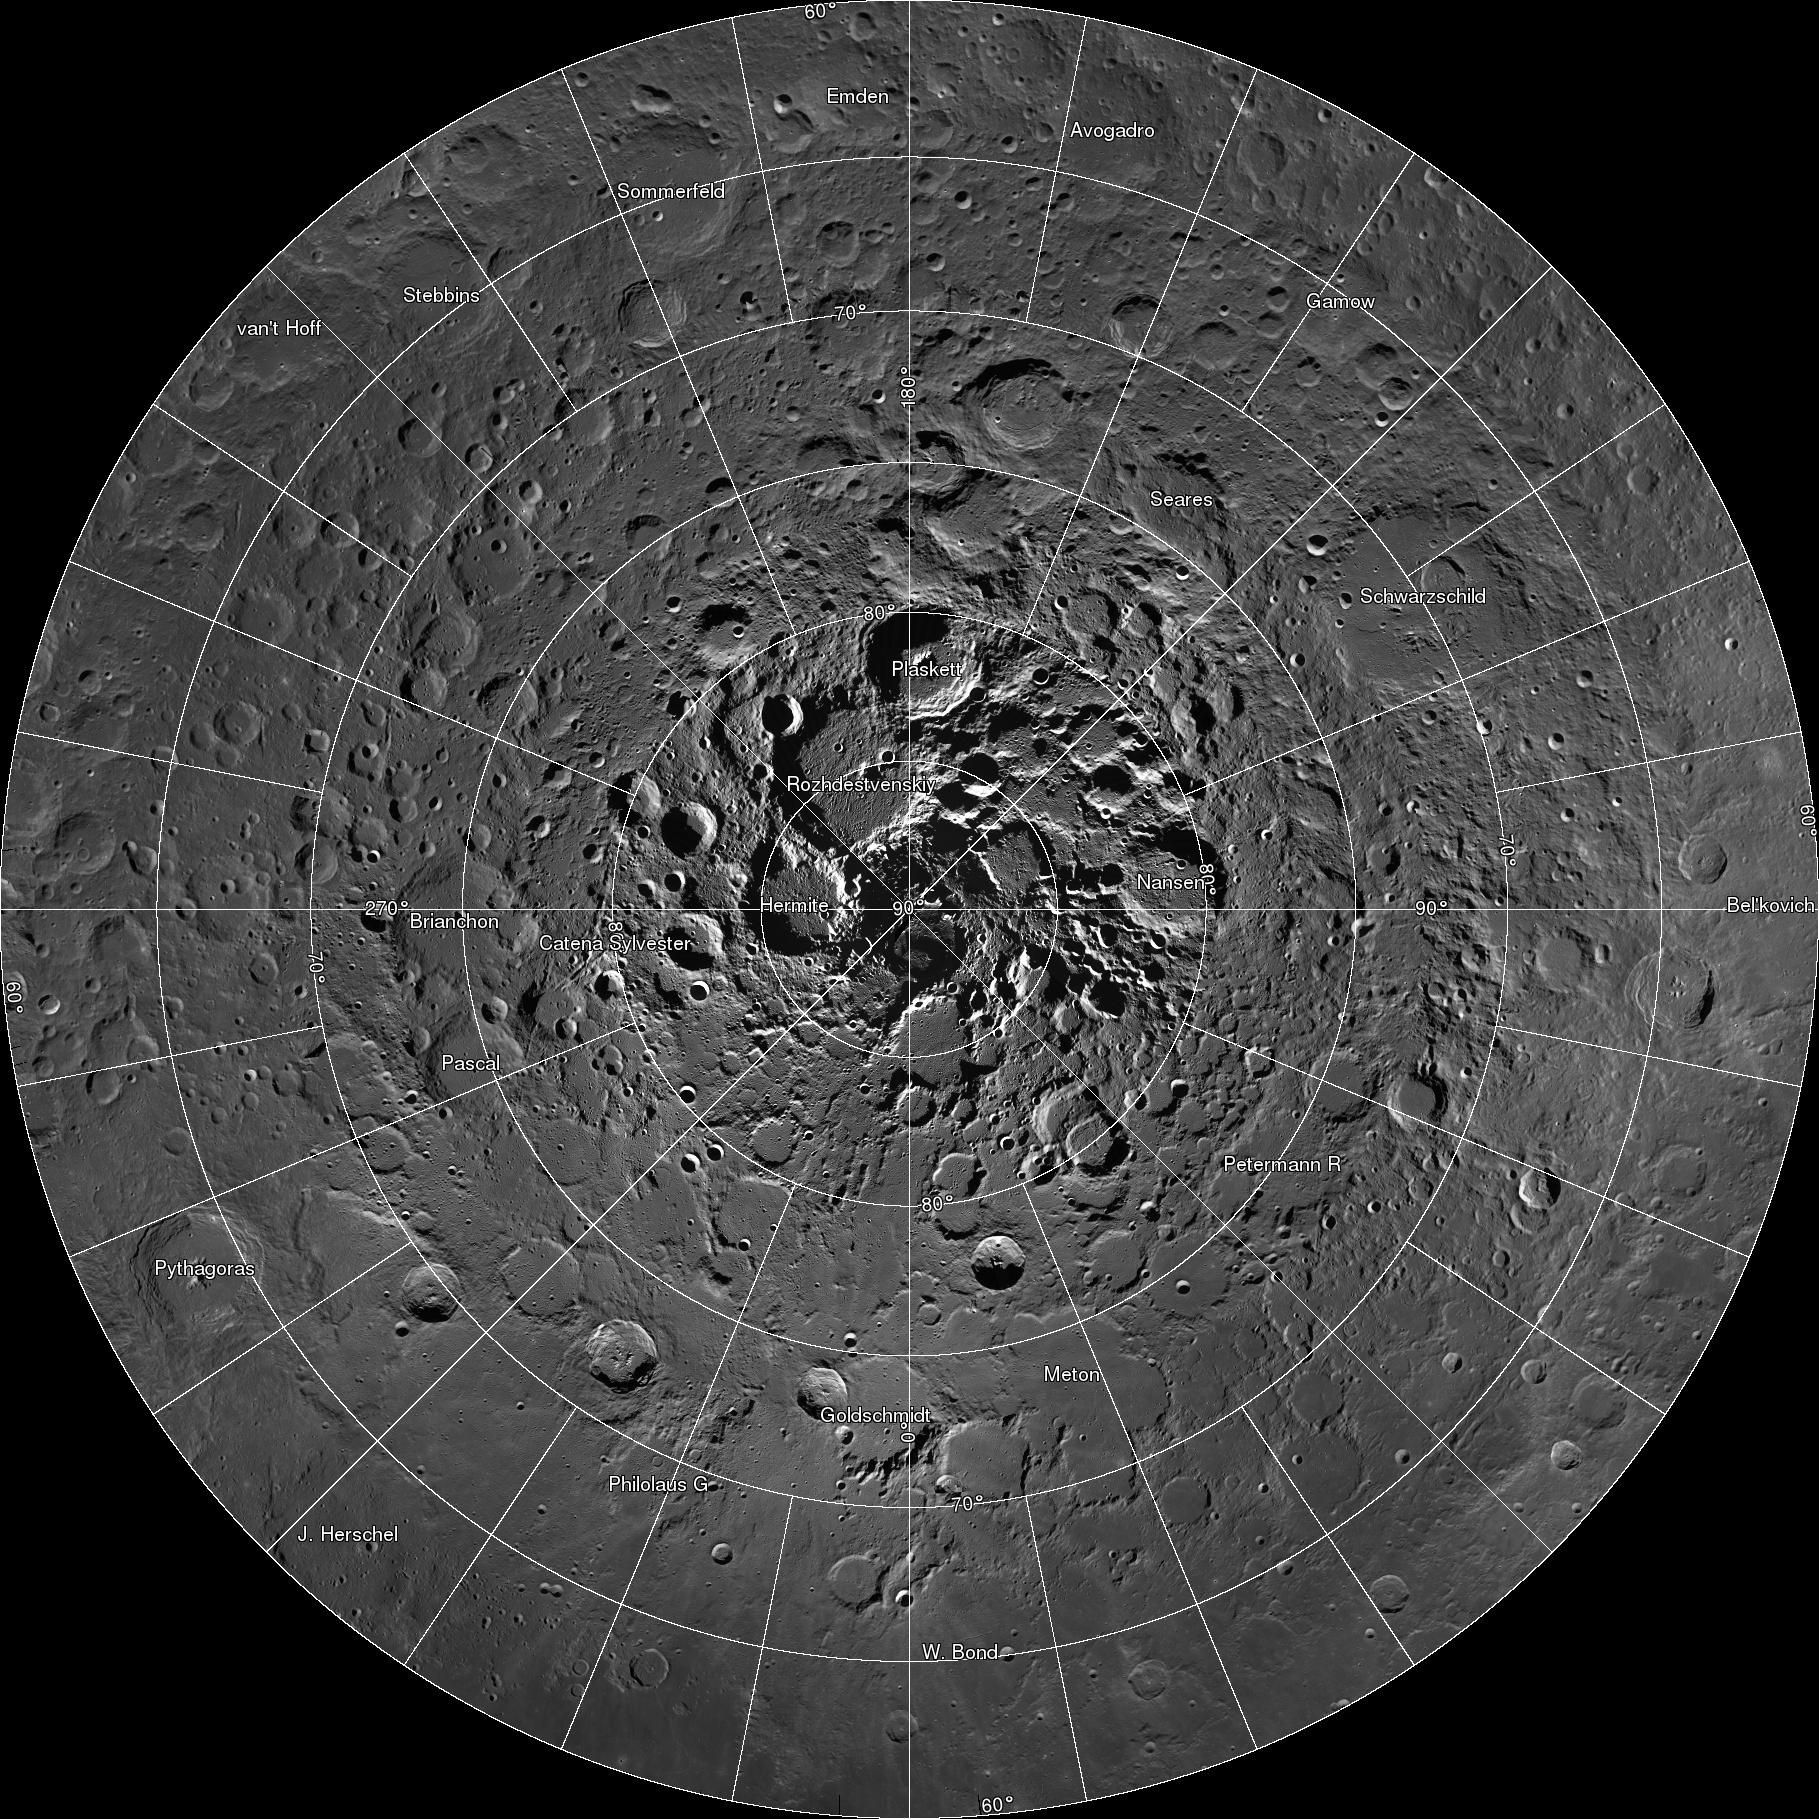 01_12_lunar_north_pole_philolaus